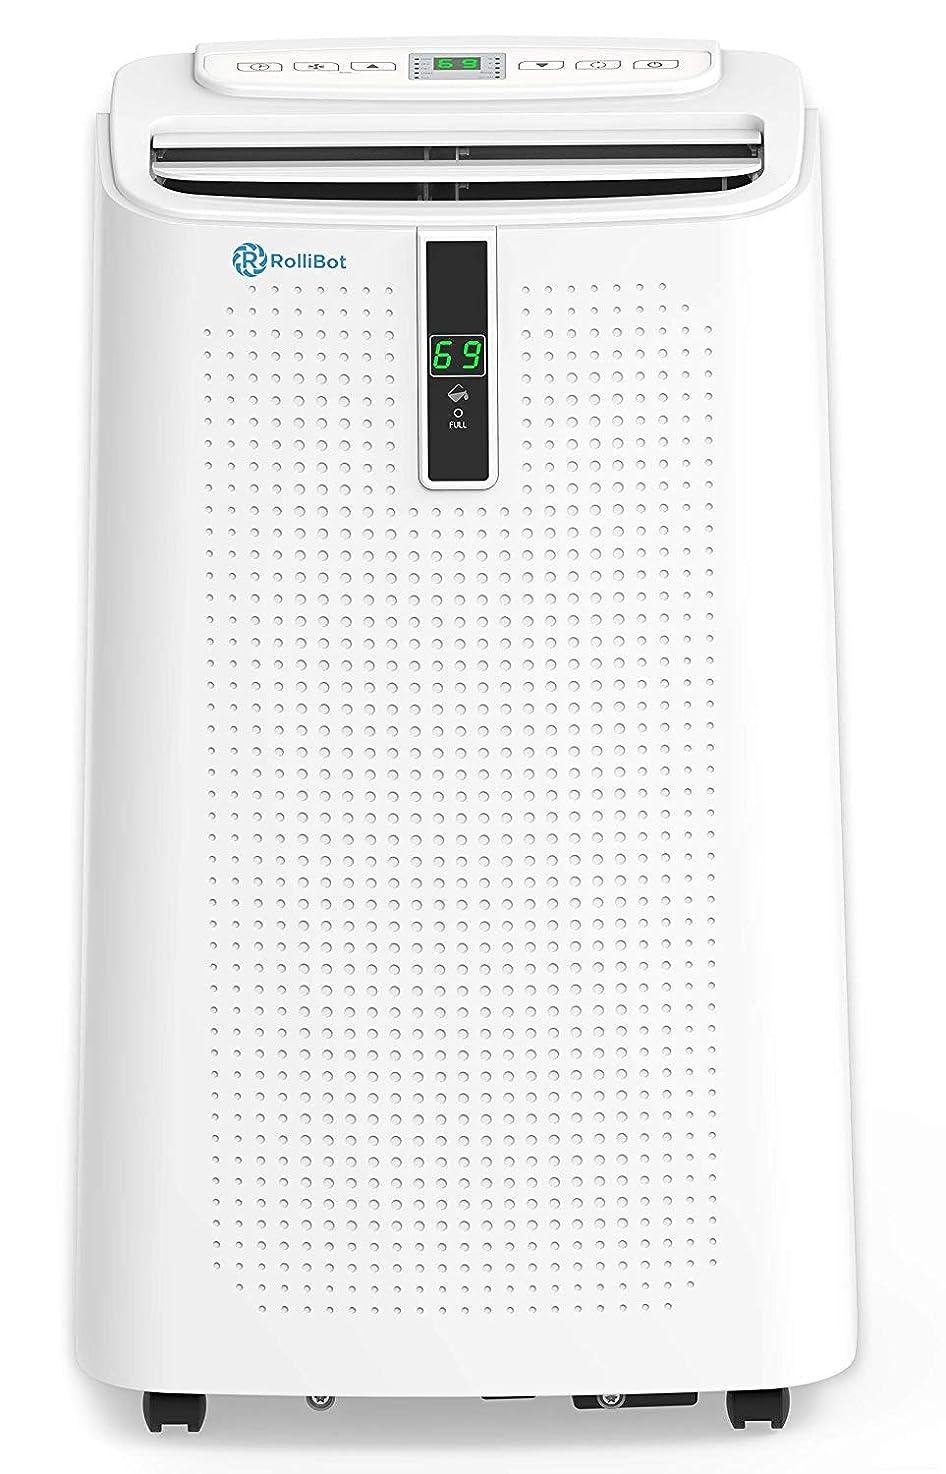 RolliCool Alexa-Enabled Portable Air Conditioner 12,000 BTU AC Unit with Heater, Dehumidifier, Fan, Mobile App (COOL310-19) ozgiblvwxyedq1